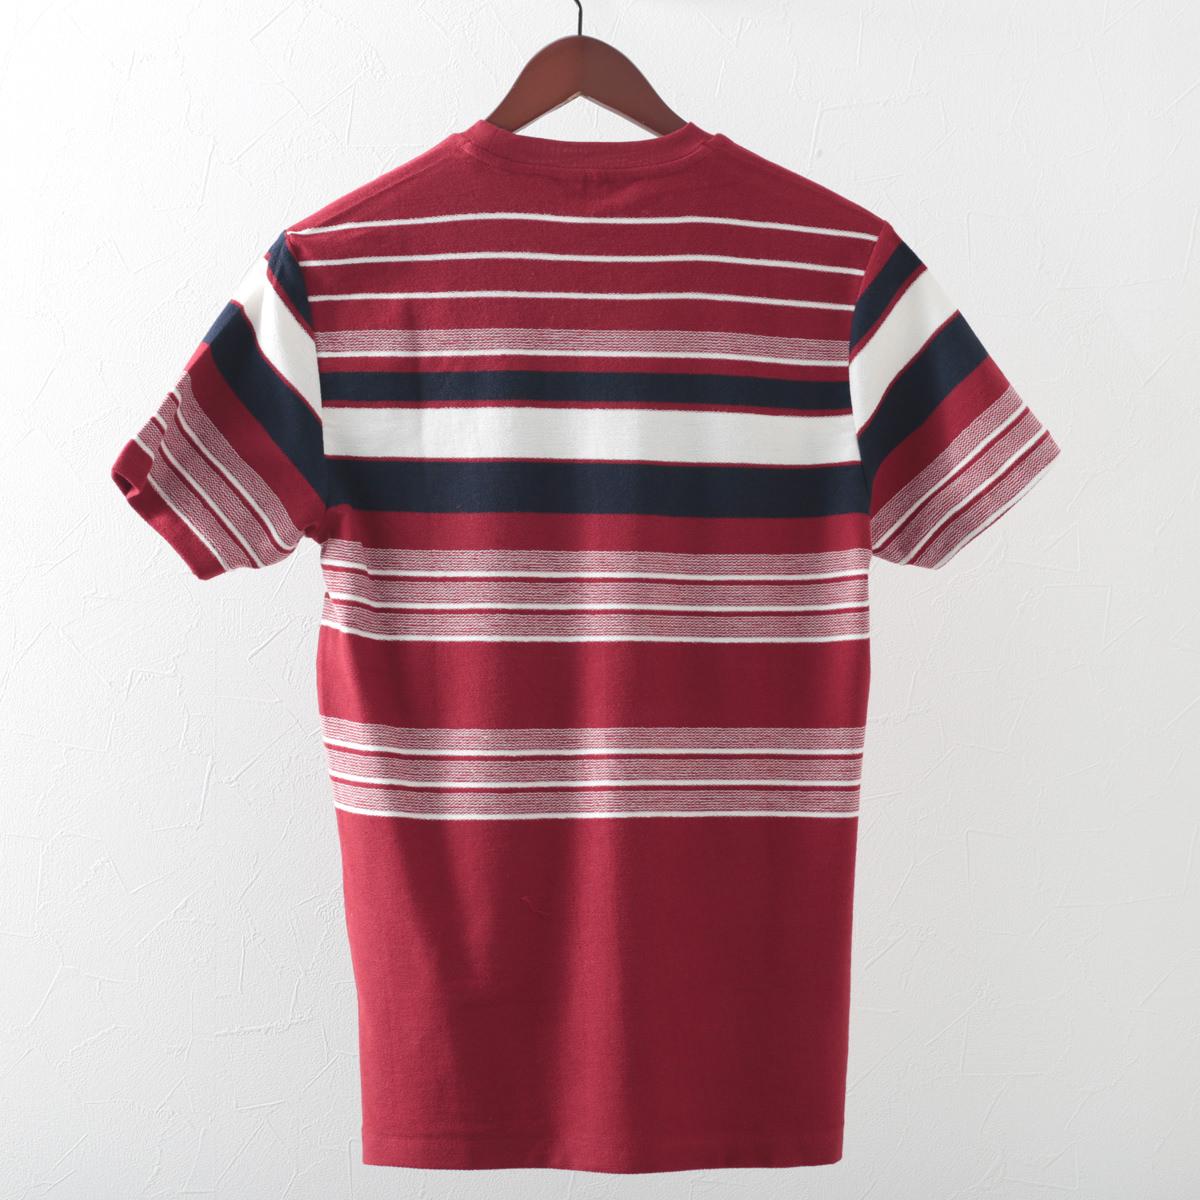 Tシャツ リバース ニット ストライプ スノーホワイト レッド レギュラーフィット Ben Sherman ベンシャーマン